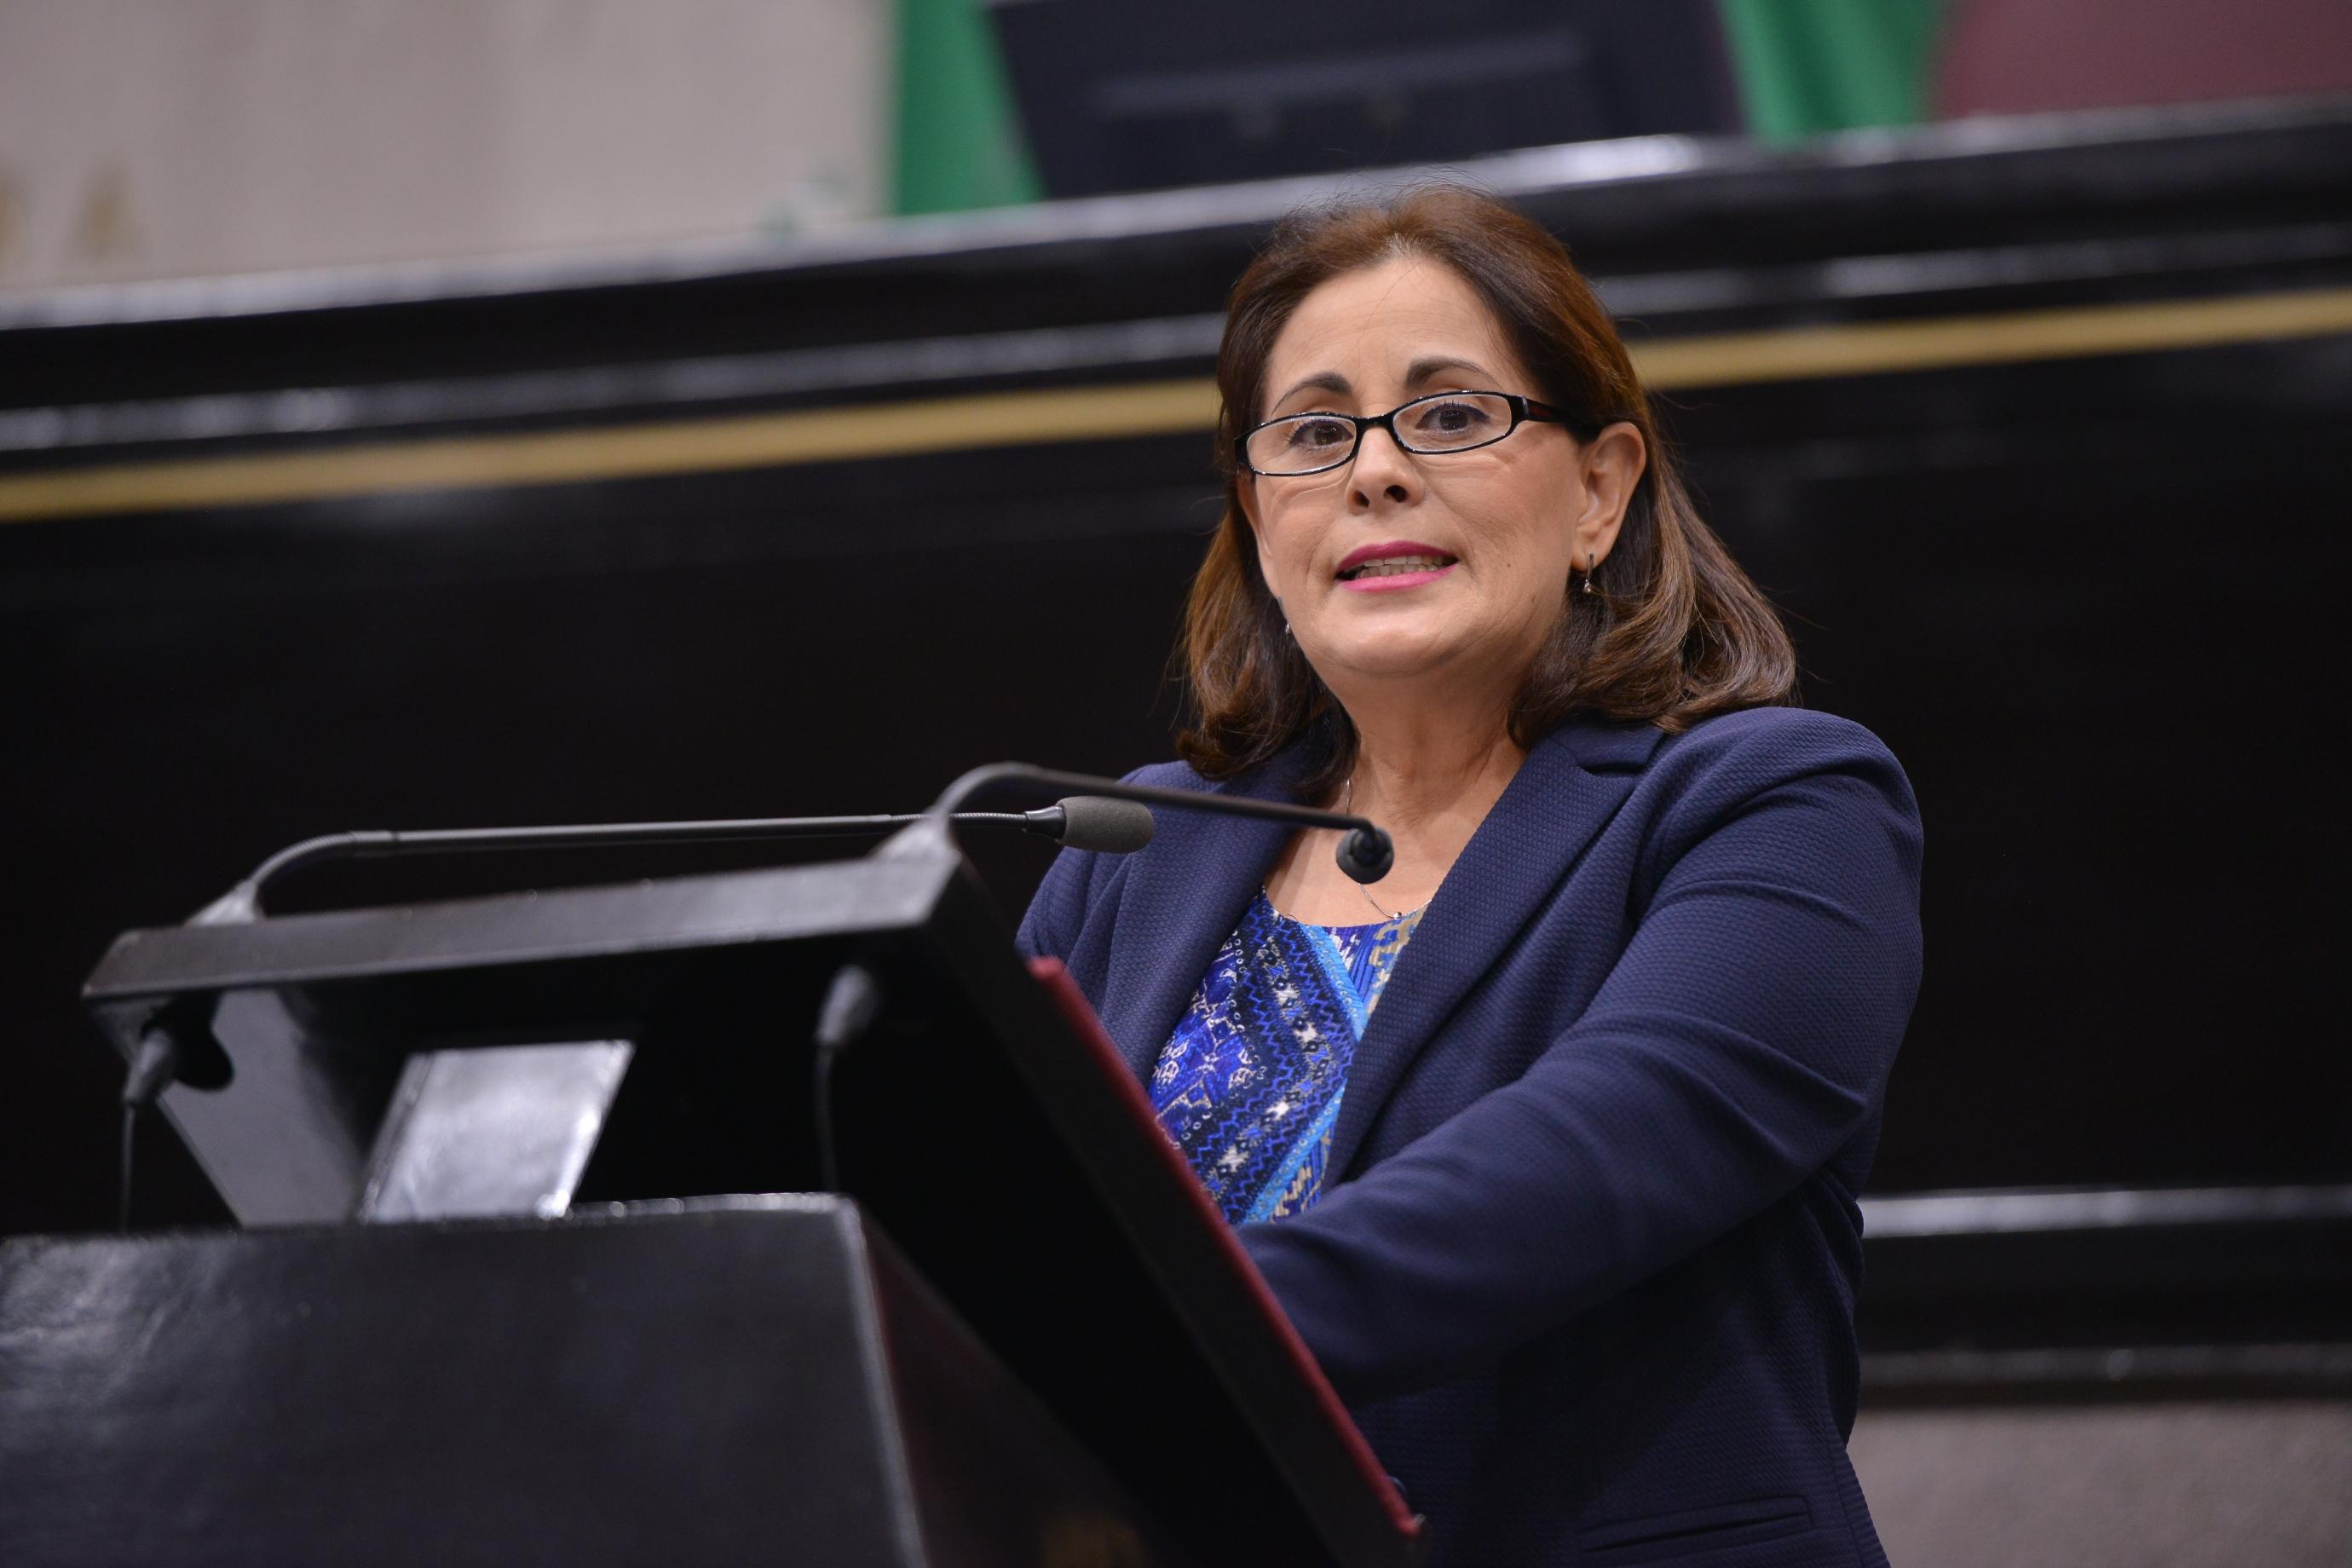 Integración de Consejos de Planeación Municipal serían por convocatoria  pública